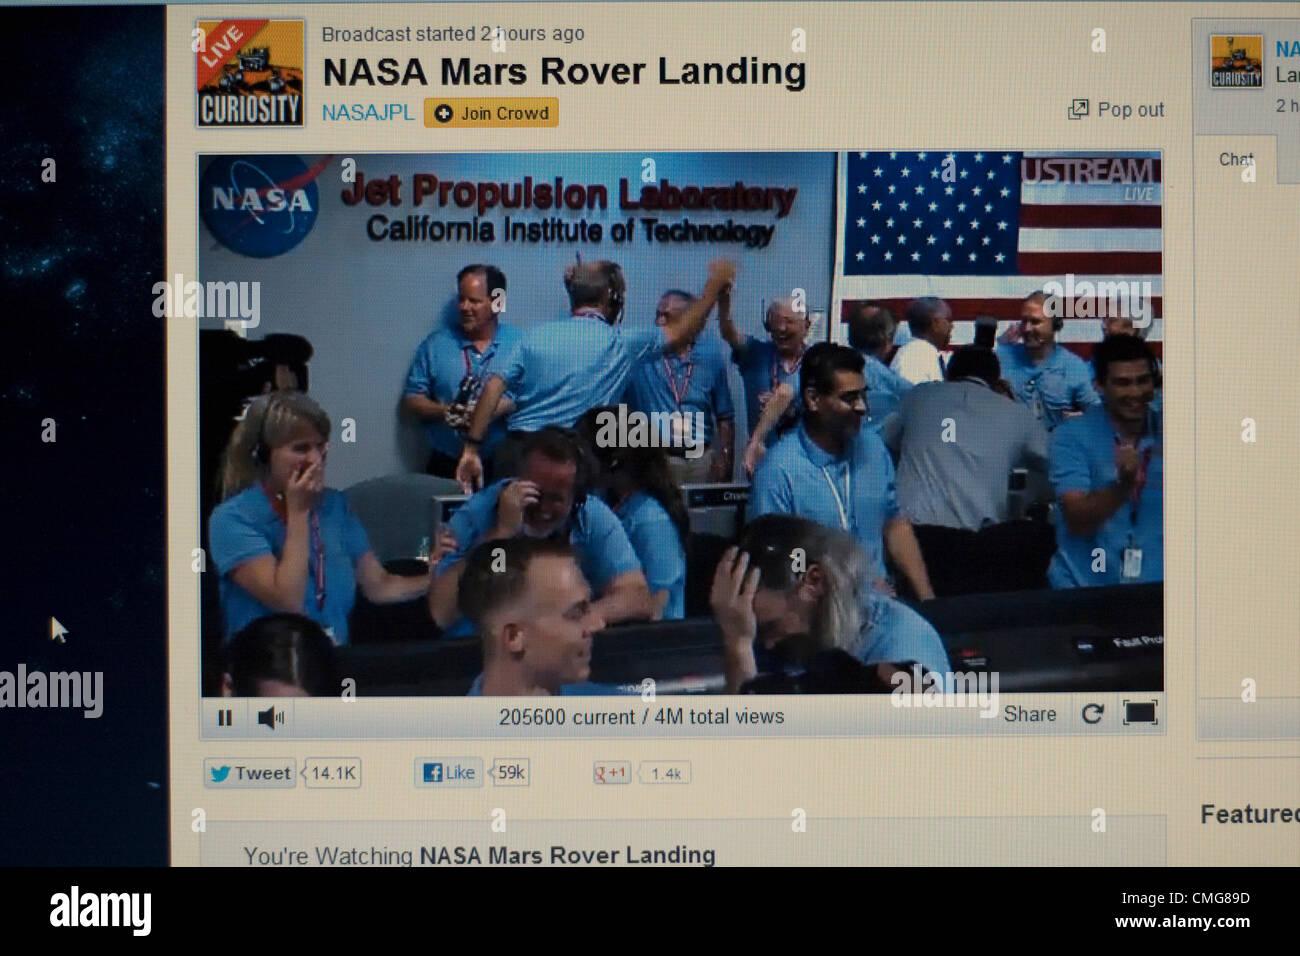 mars landing live stream uk - photo #27